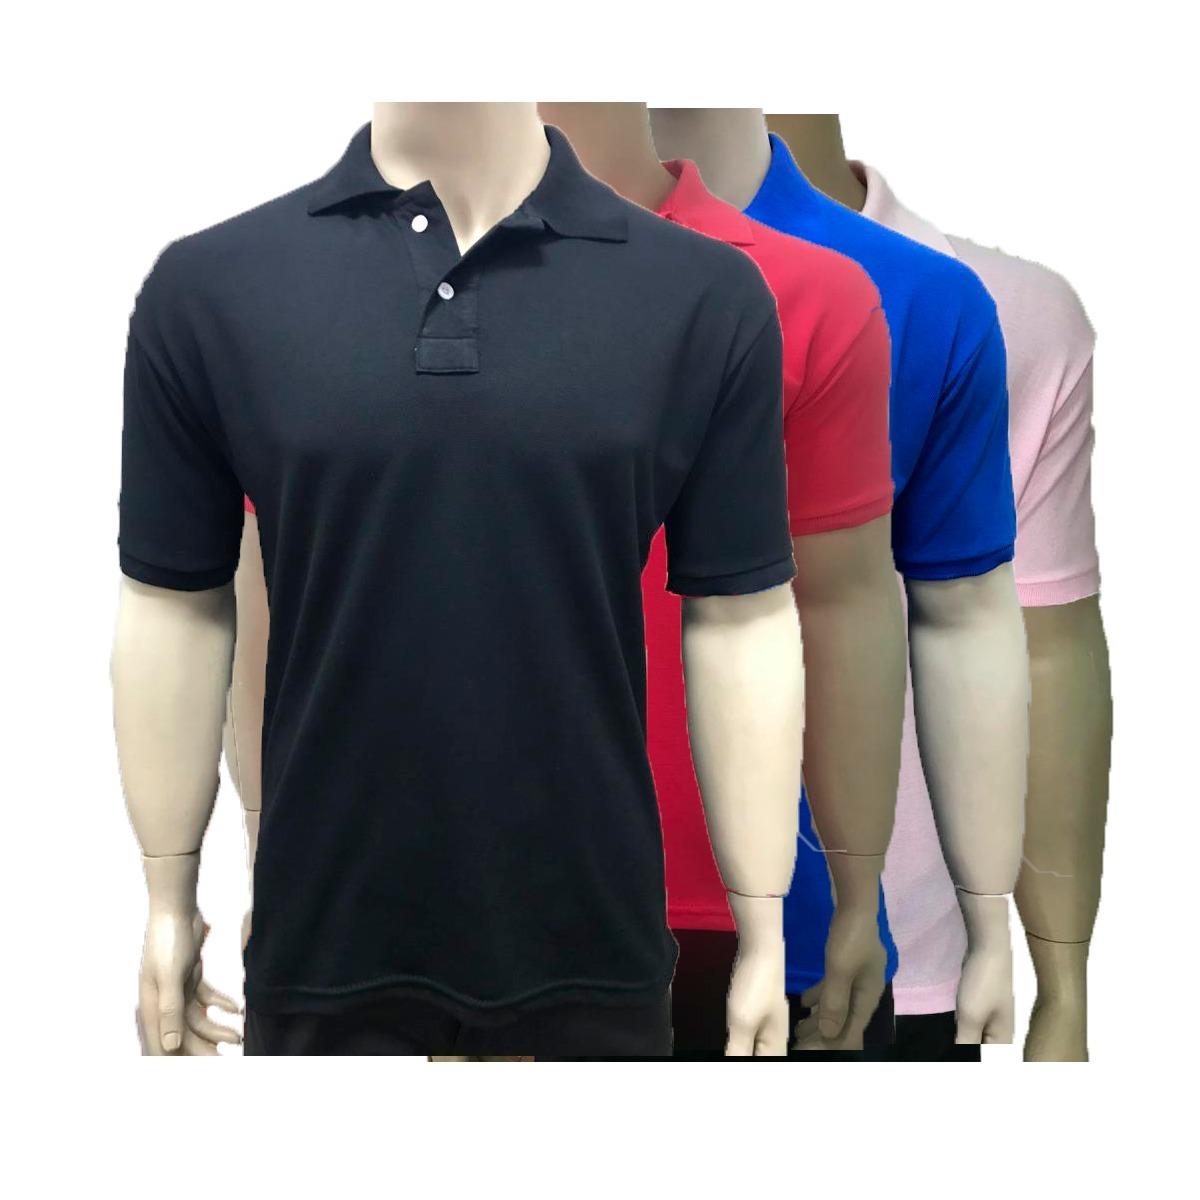 5241298fac63f kit 6 camisas gola polo marcas basicas atacado revenda lucre. Carregando  zoom.